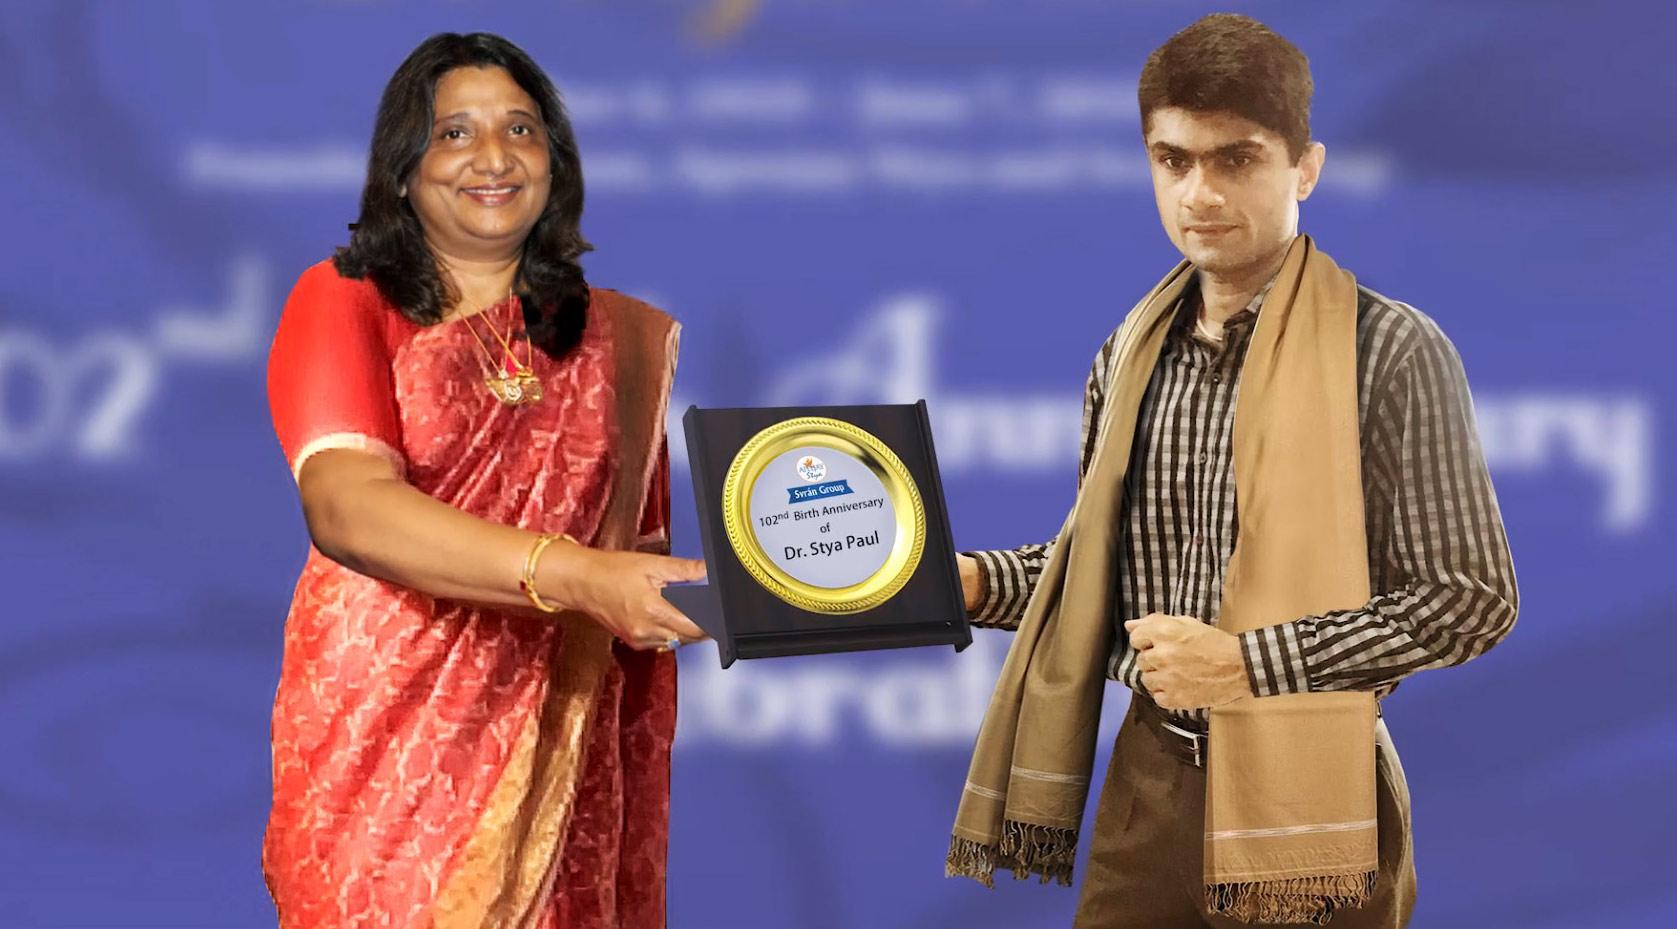 Mrs Berlia Felicitating Mr Suhas Yathiraj